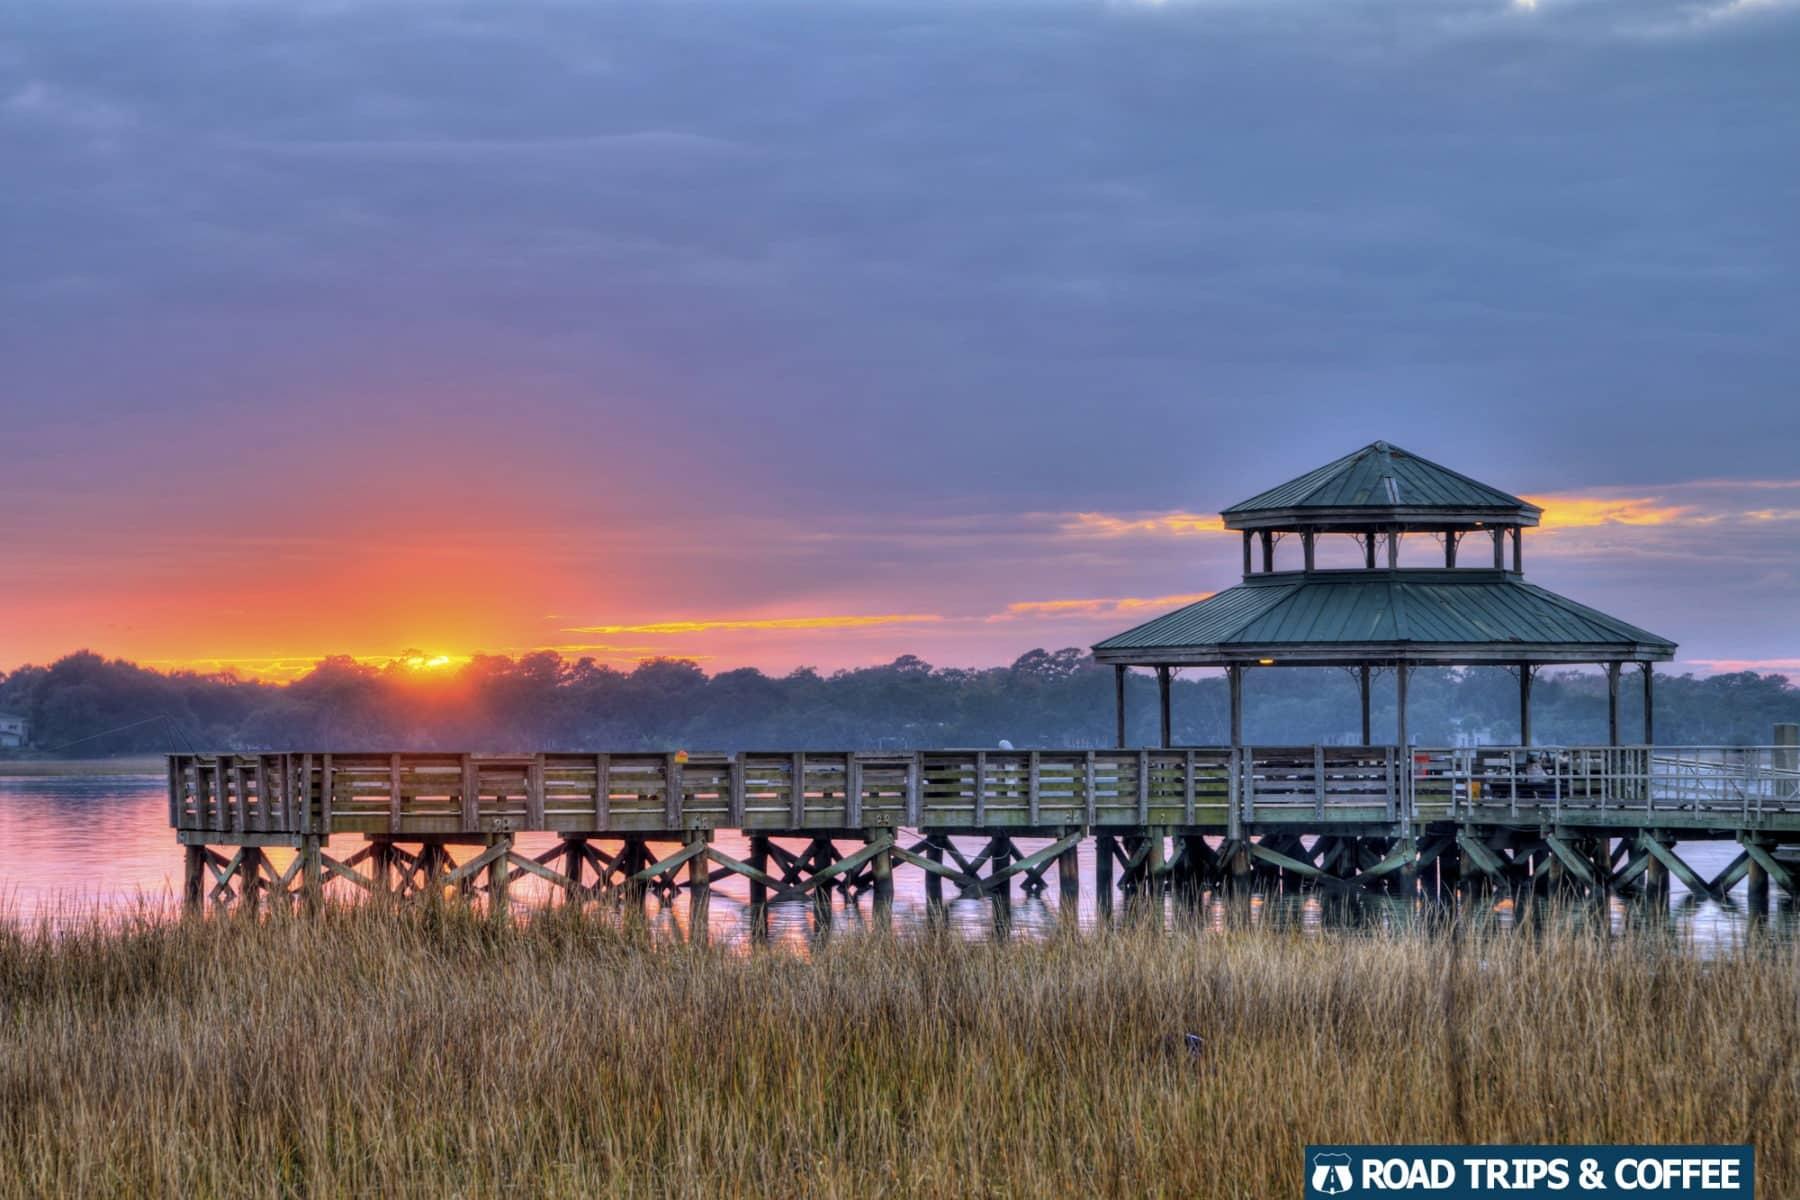 Sunset across the Ashley River at Brittlebank Park in Charleston, South Carolina